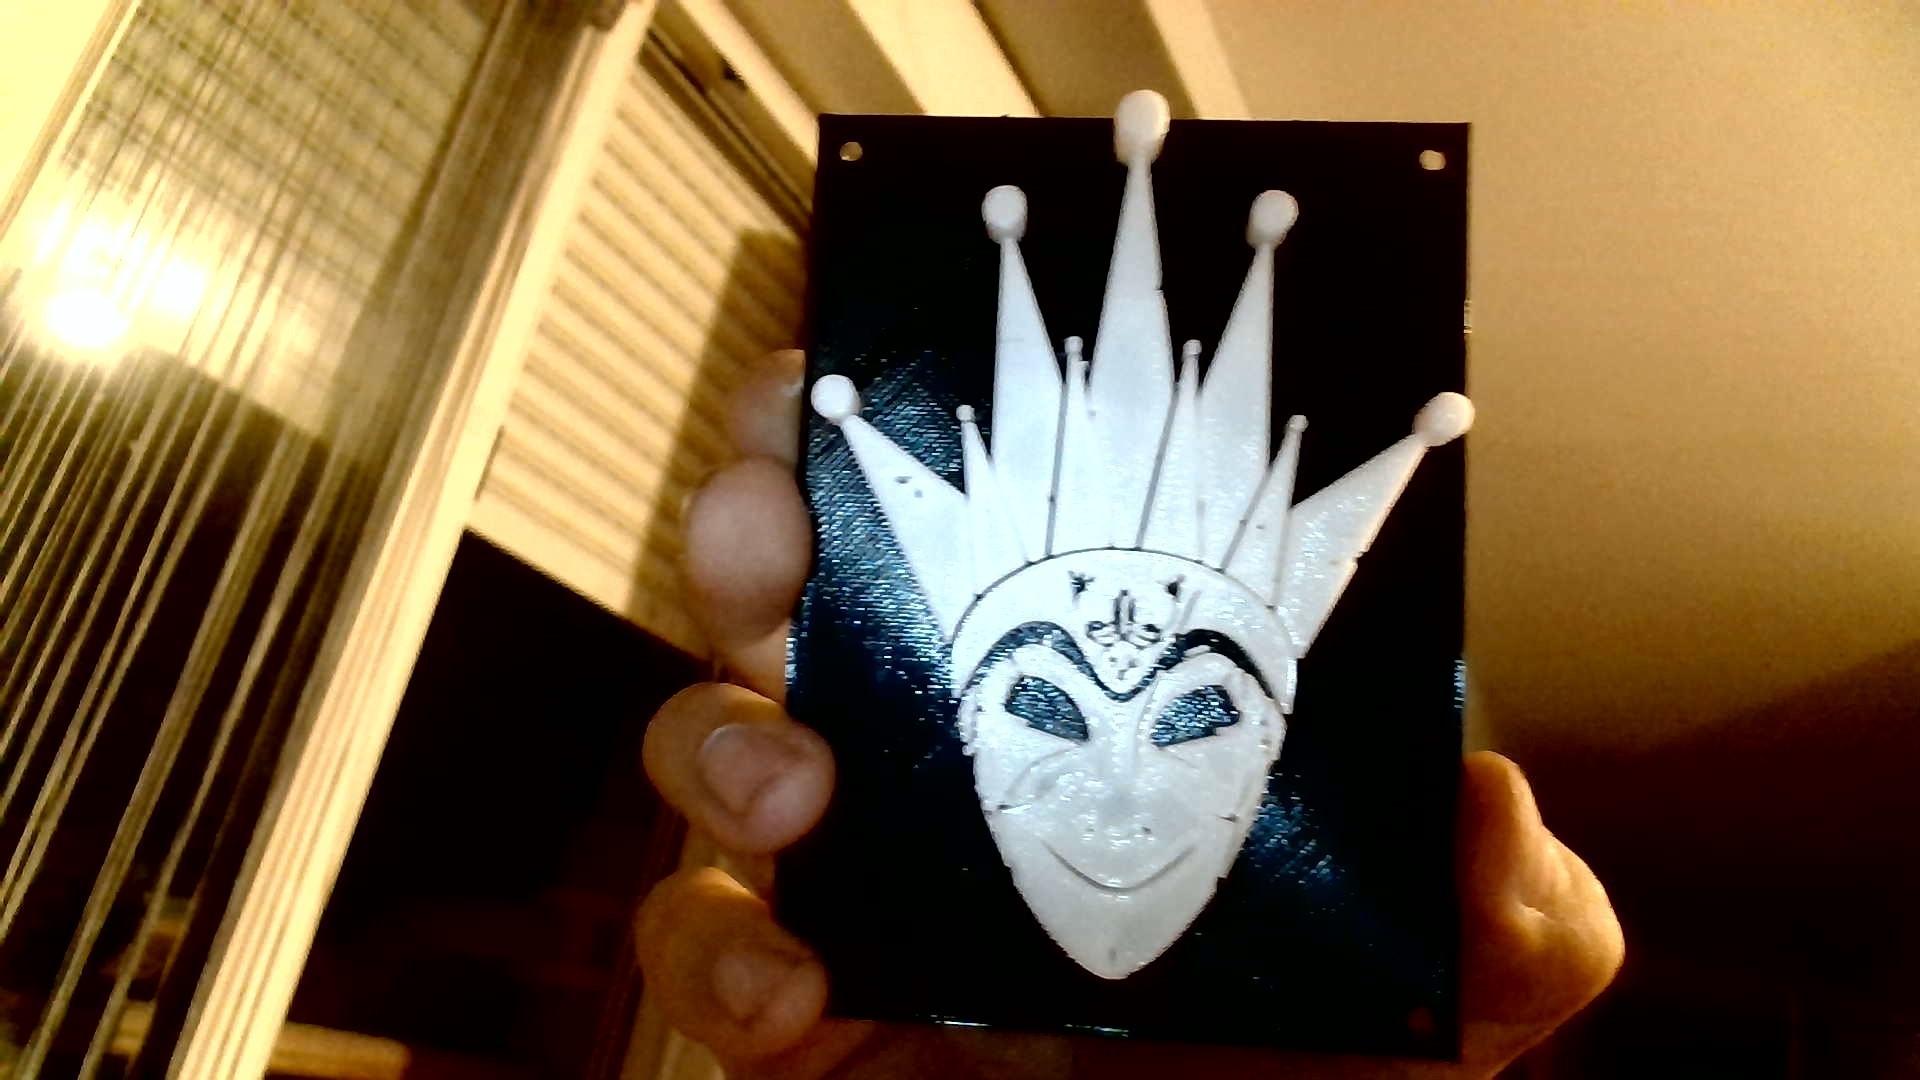 WIN_20200817_21_45_14_Pro.jpg Download free STL file Boris Brejcha Mask v1 • 3D printing object, La-Volailles